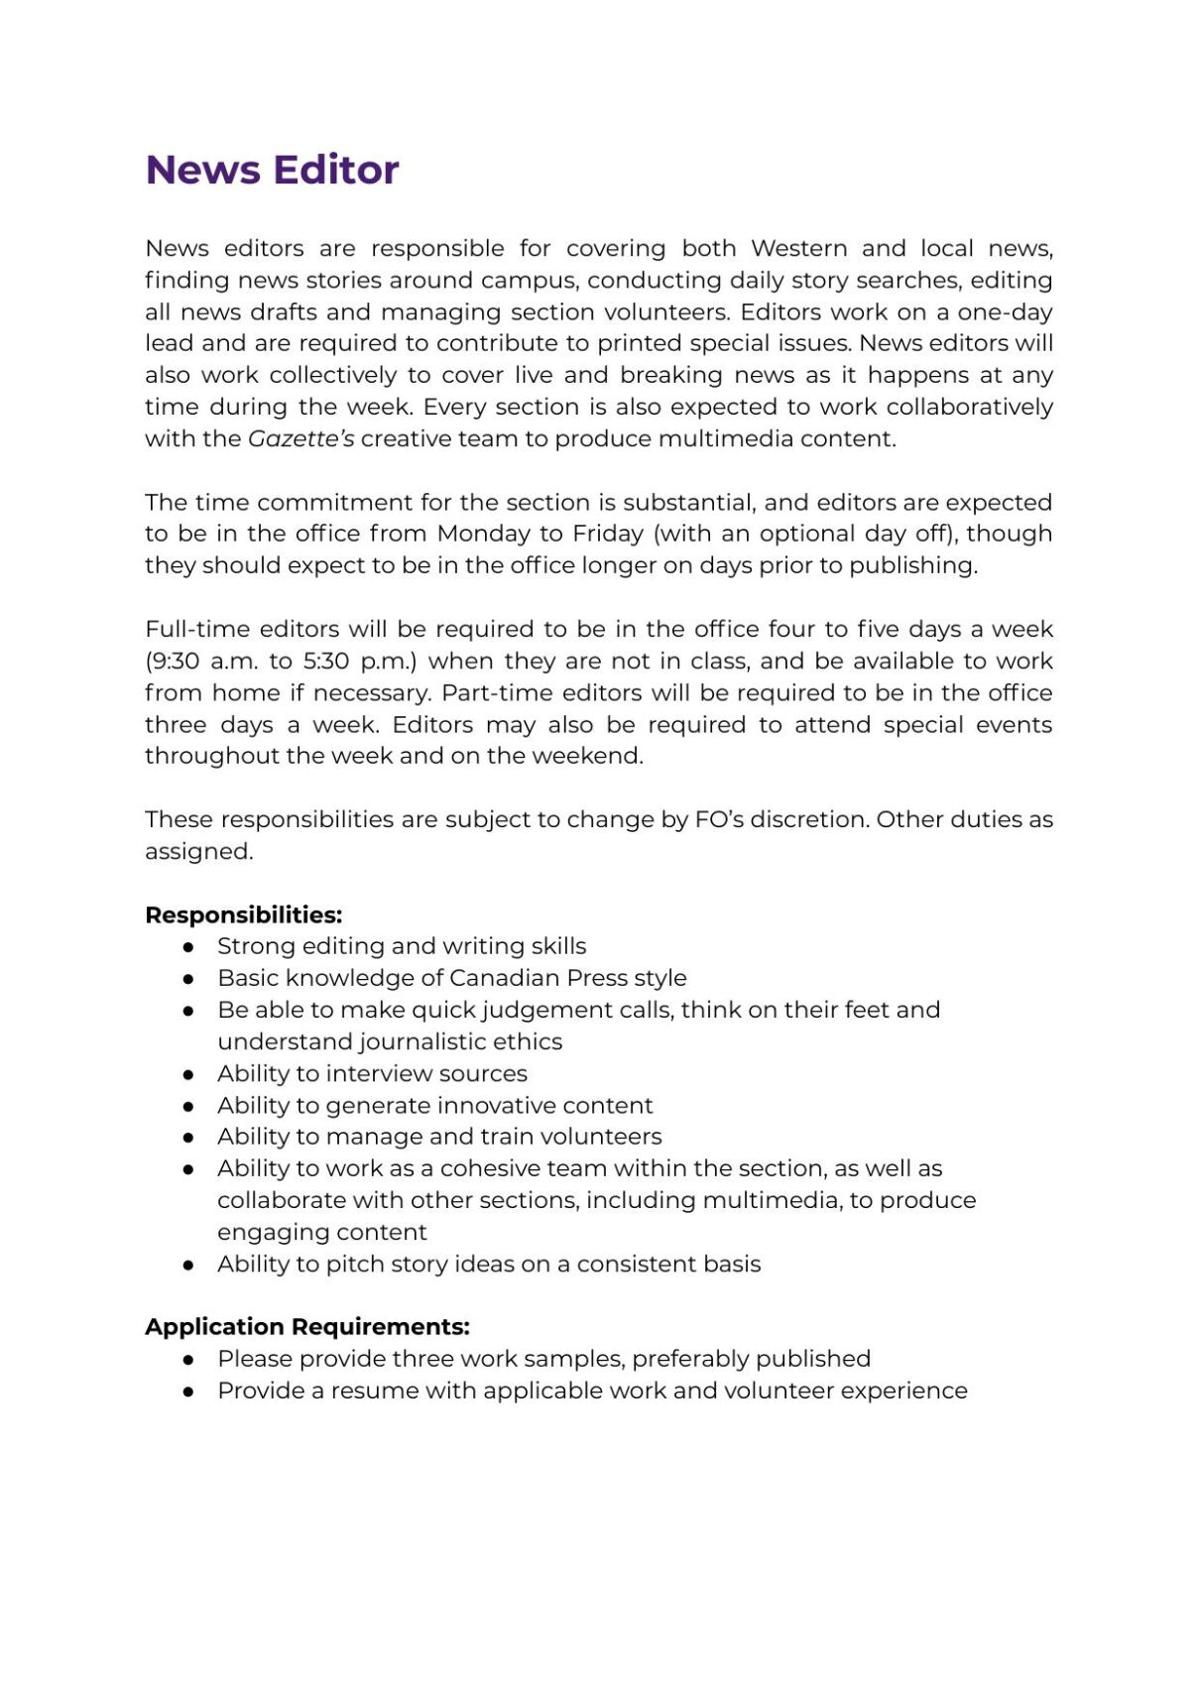 News Editor Job Description 2021